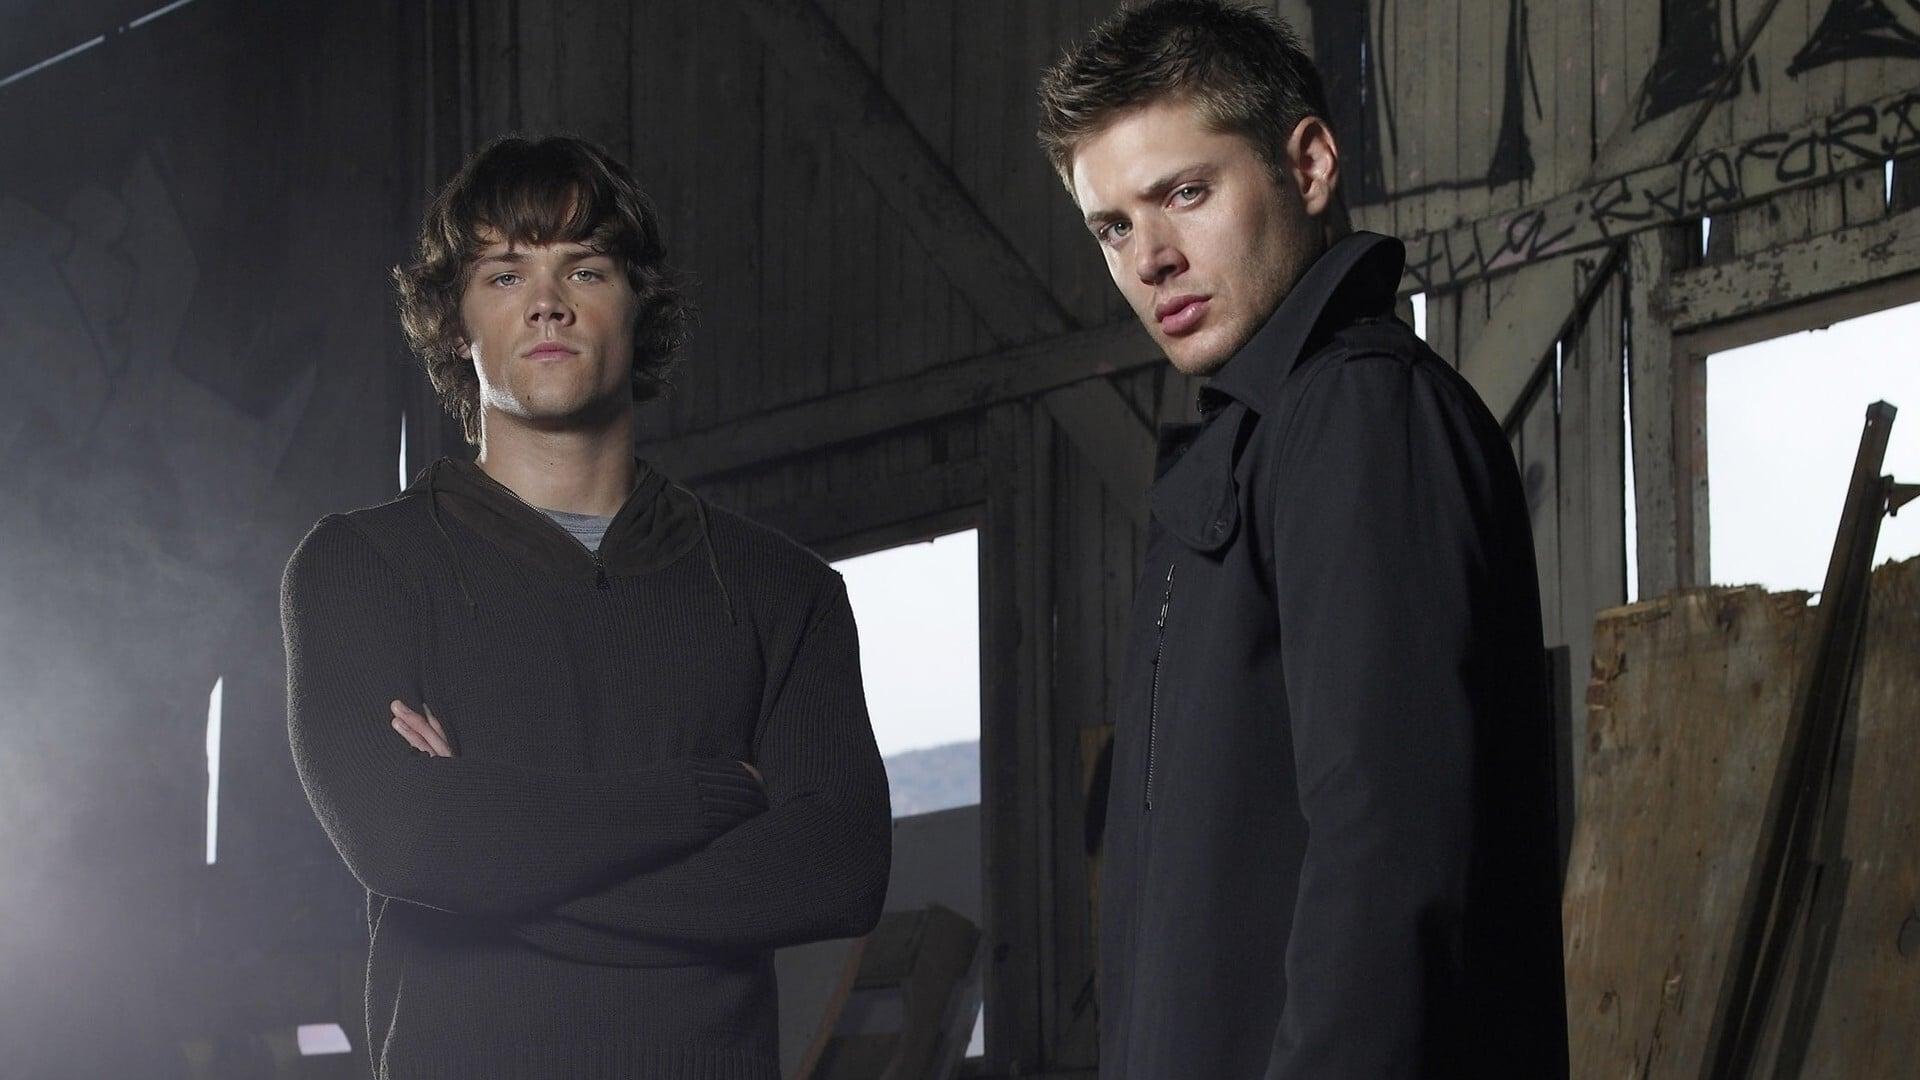 Supernatural - Season 8 Episode 21 The Great Escapist